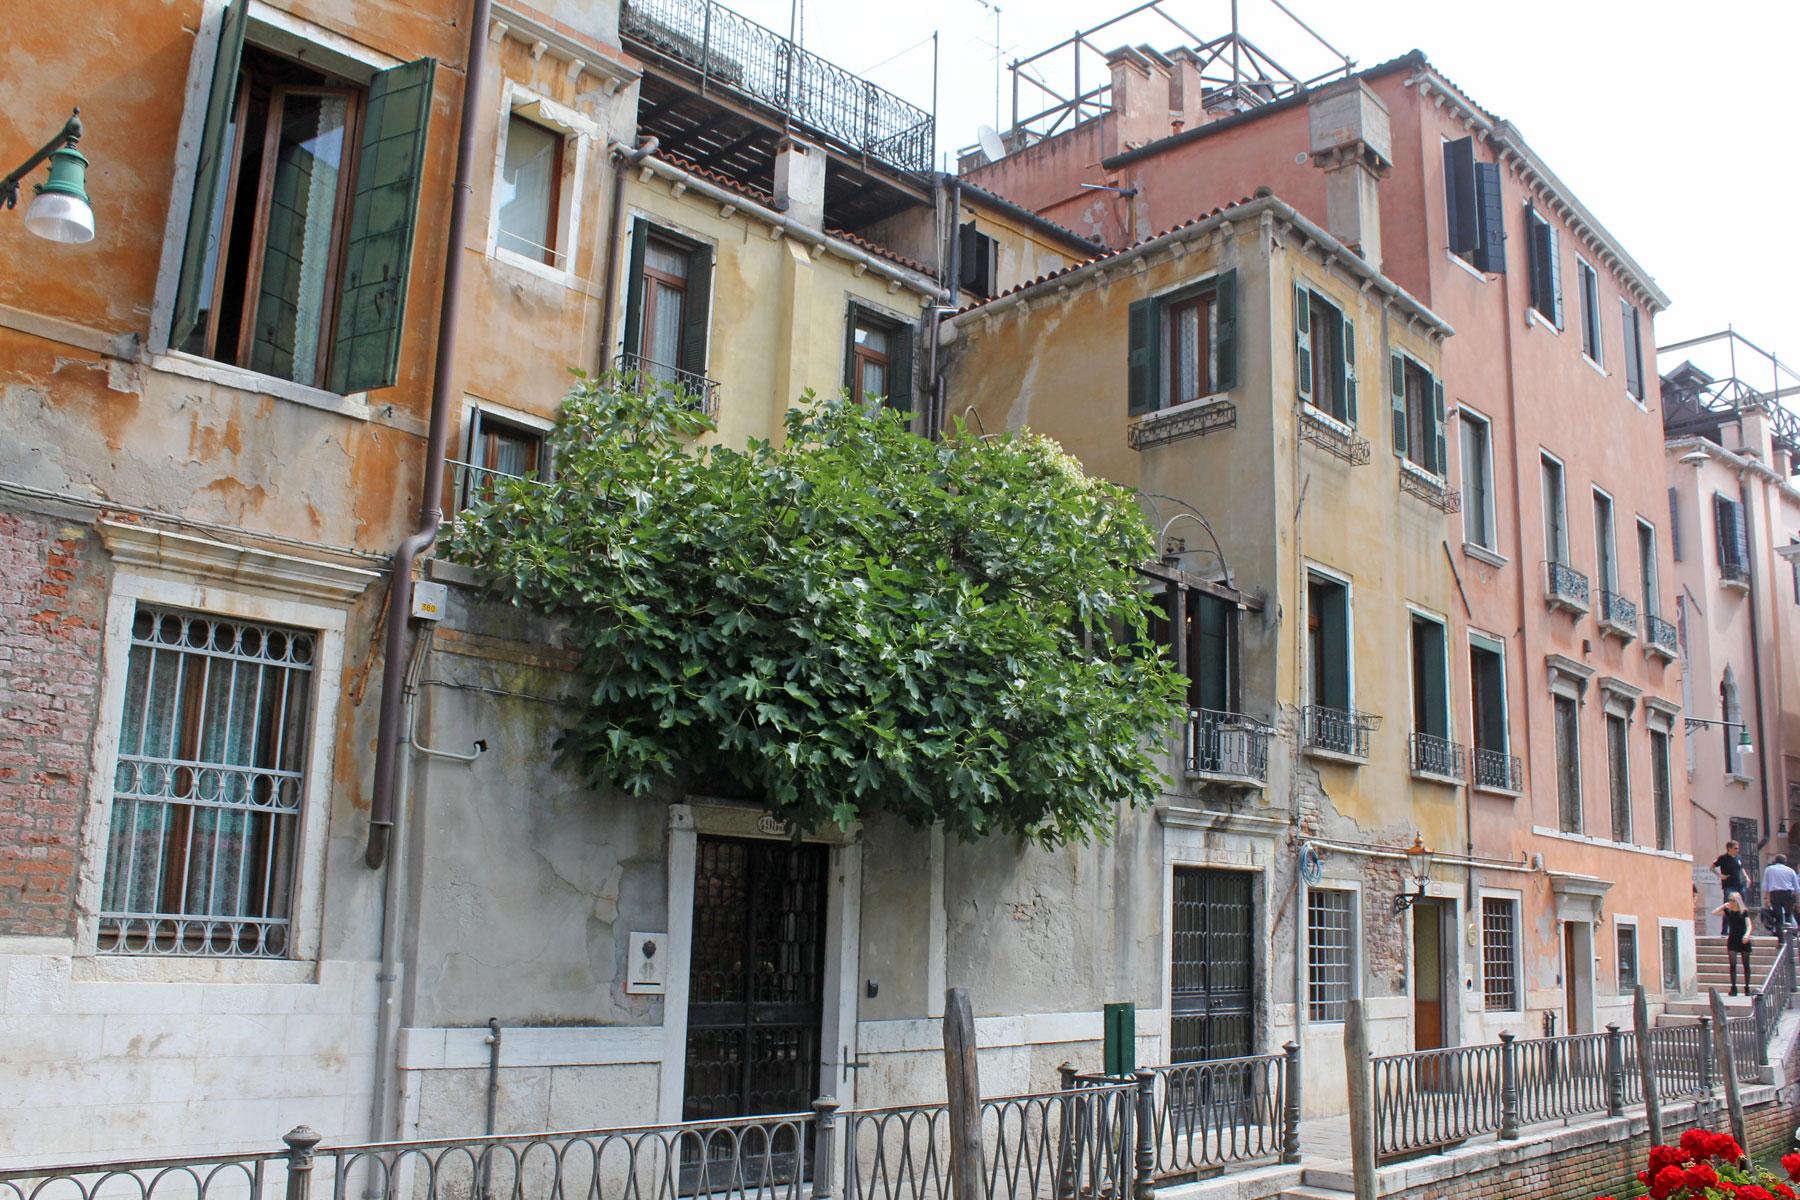 Feigenbaum in Venedig